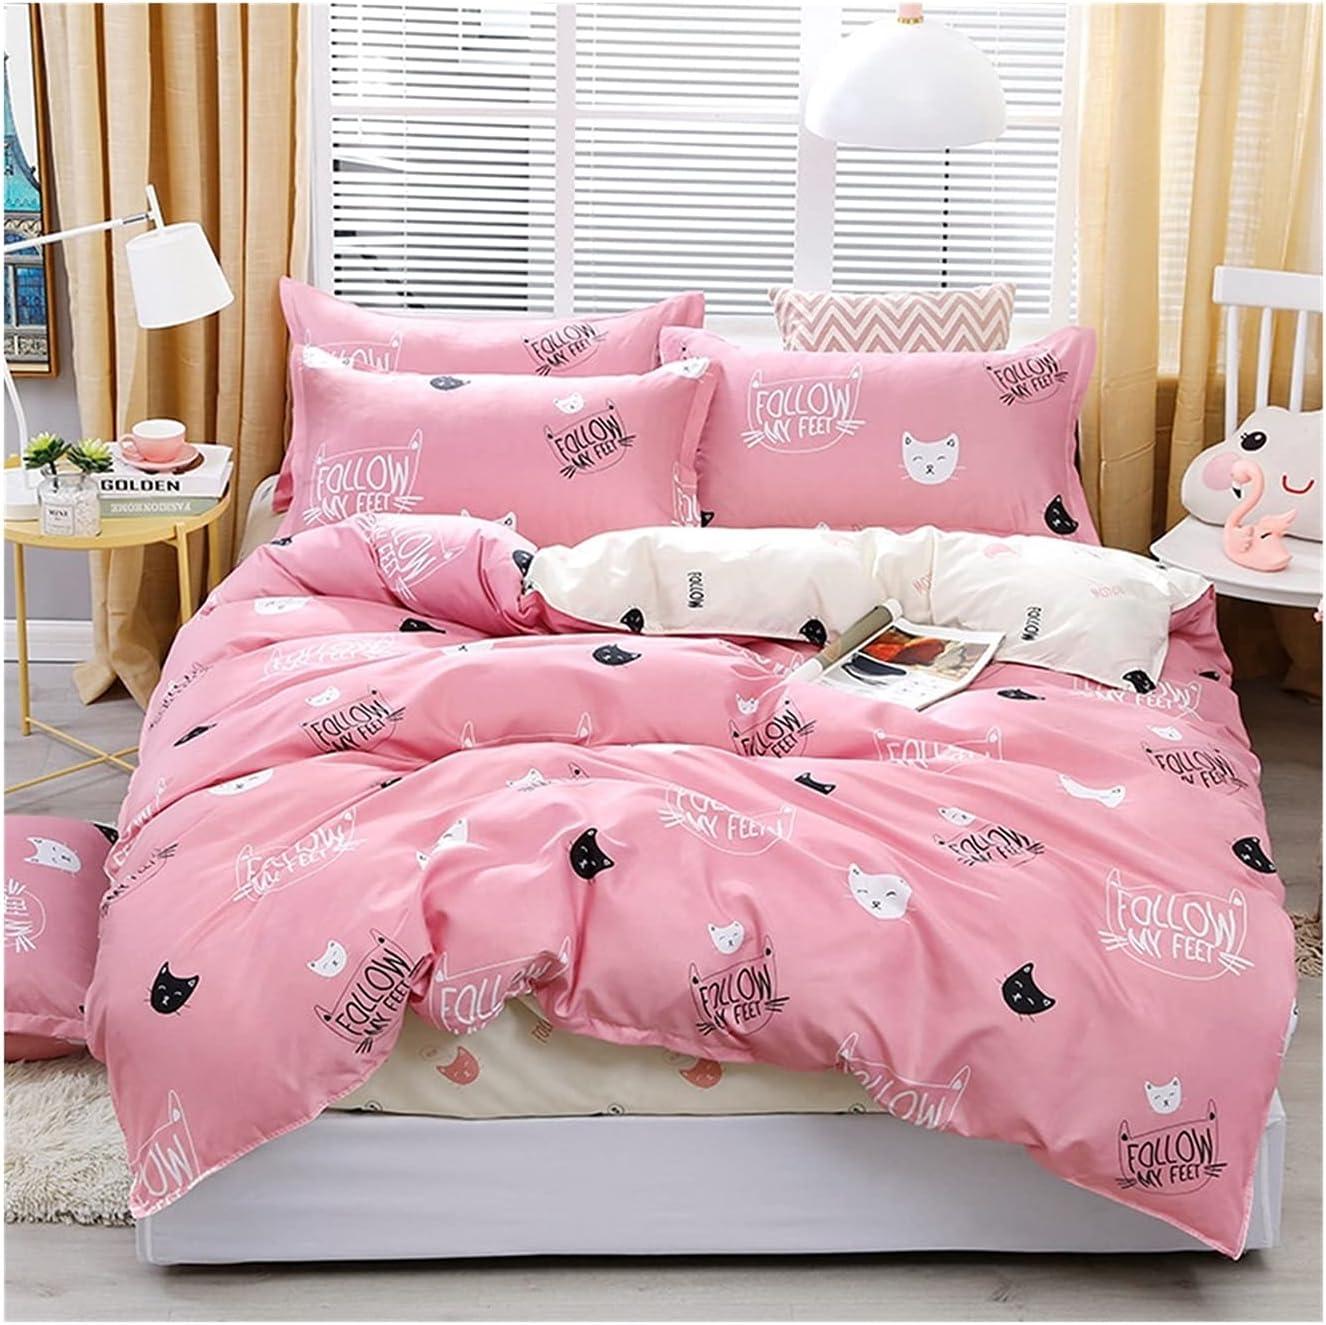 Max 84% OFF LSDJ QMDSH Home Max 89% OFF Textile Girl Bedding Duvet Peach Pink Set Cover